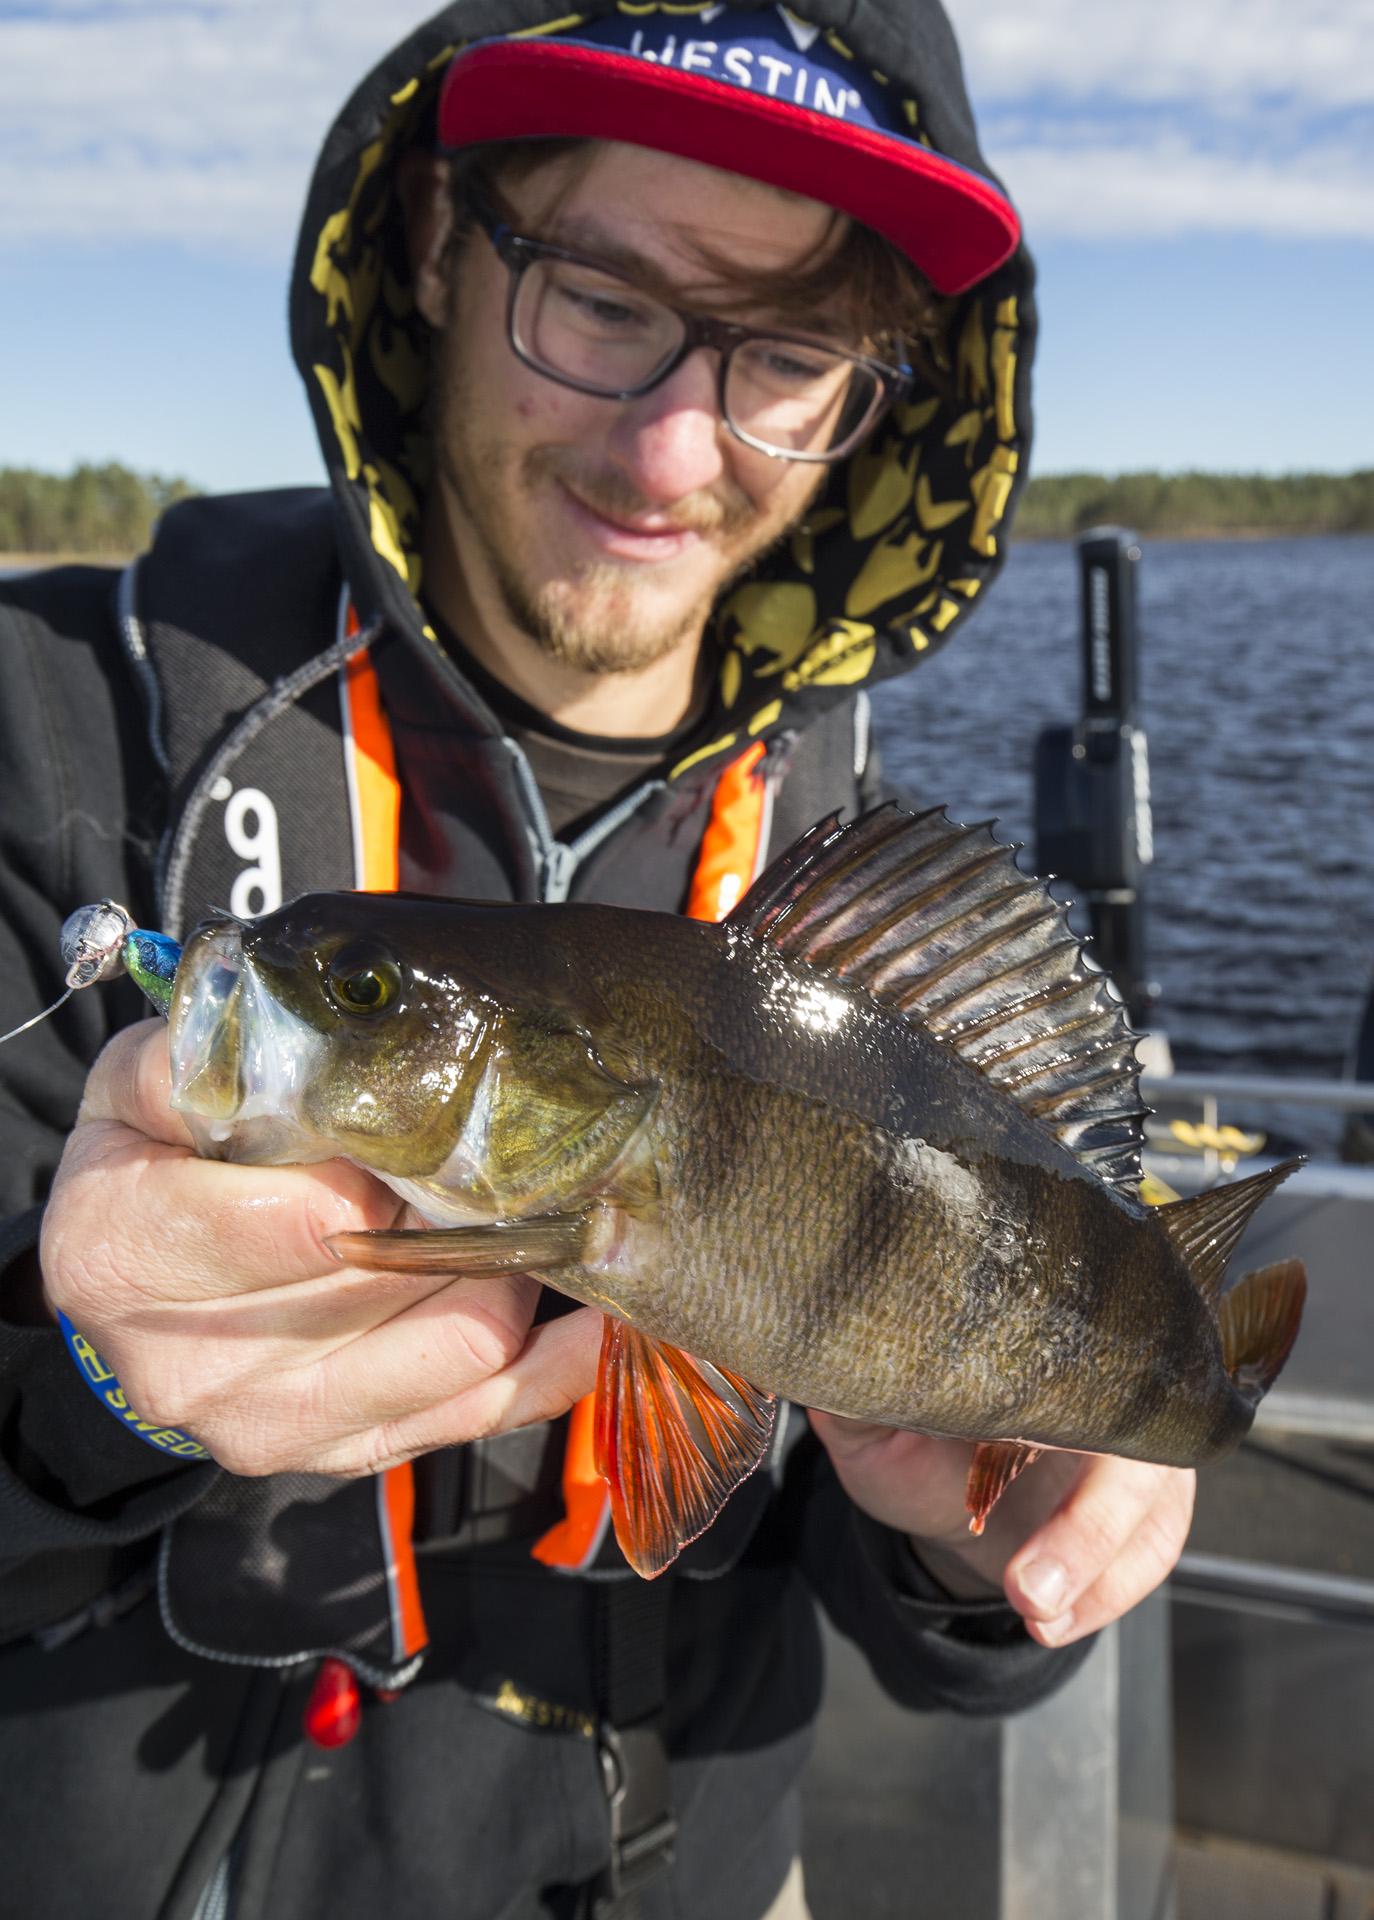 Jigg & vertical fishing